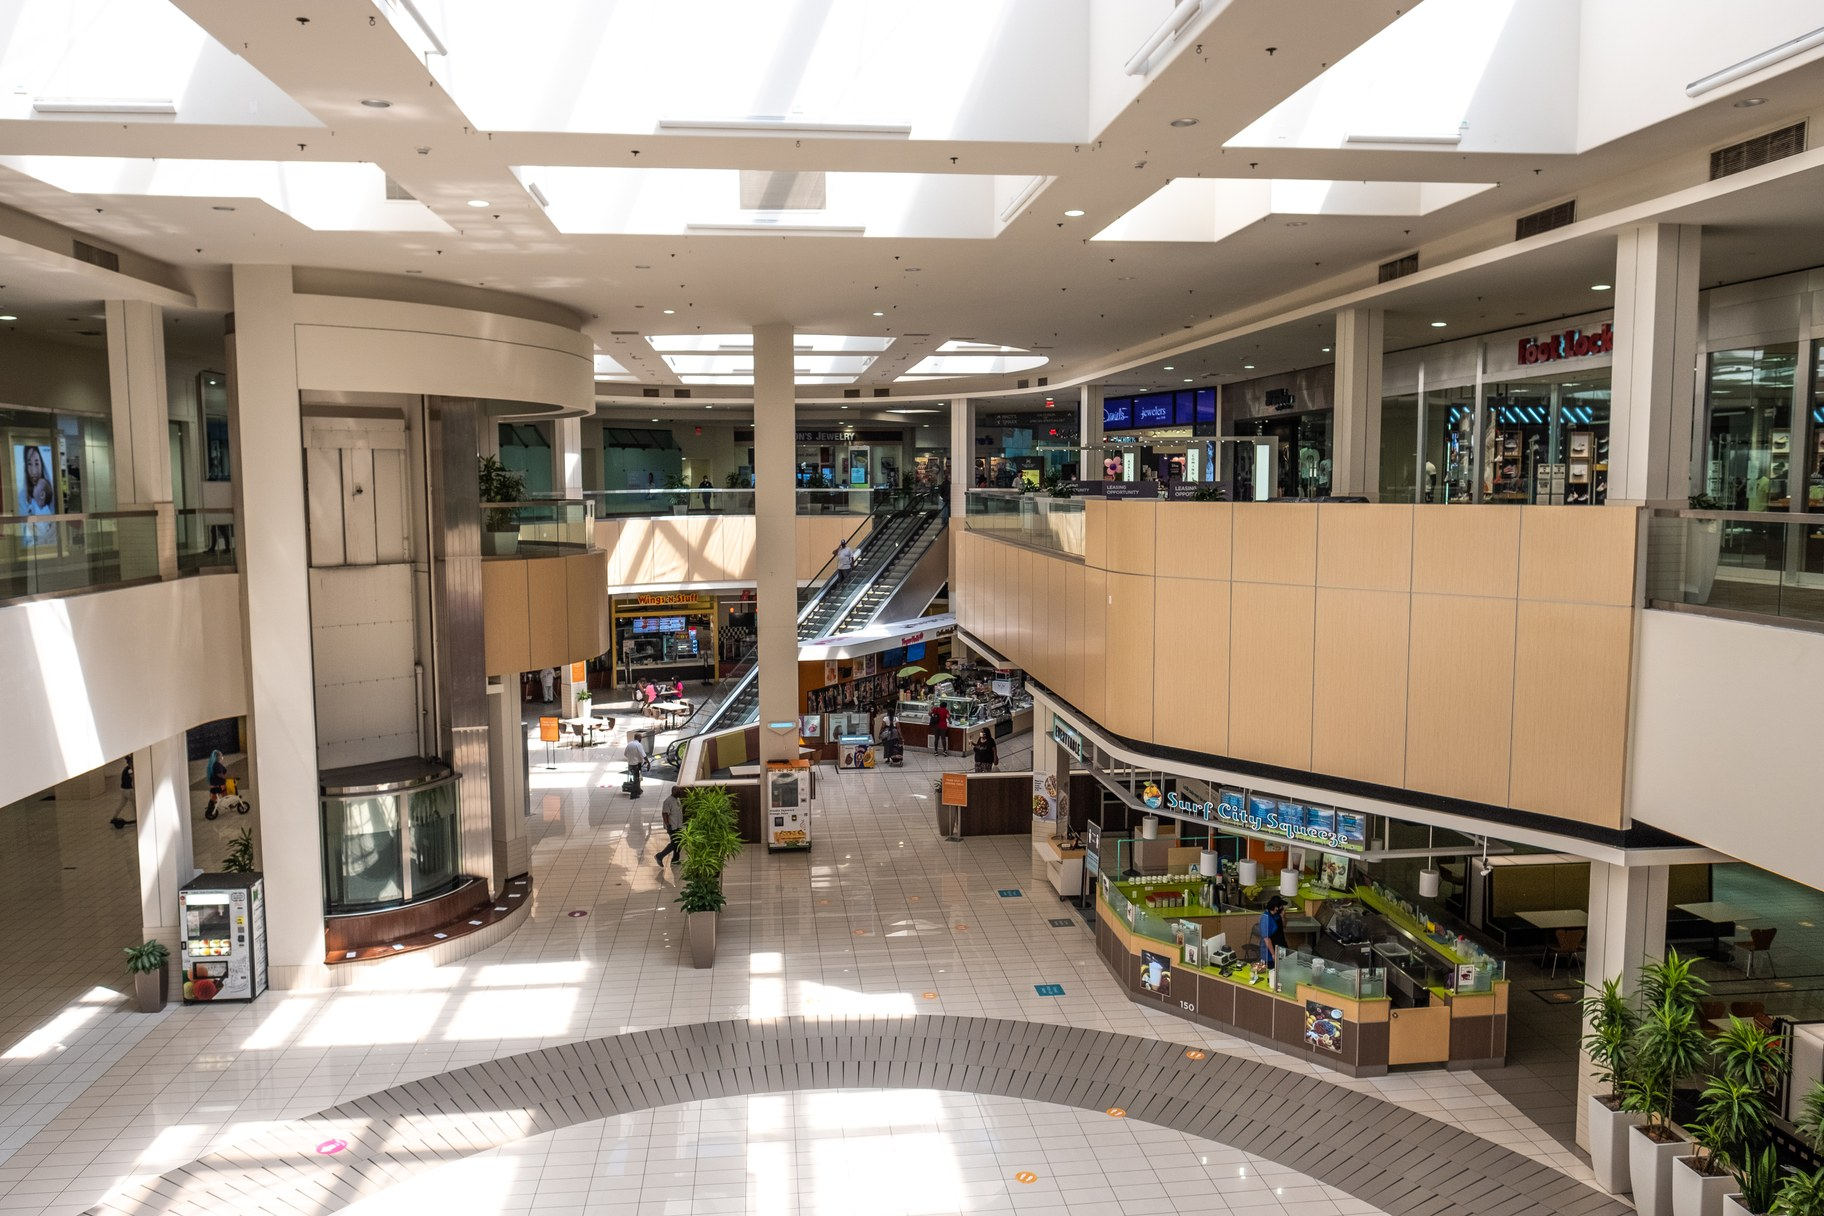 Baldwin Hills Crenshaw Mall-May 3 2021-Amy Ta-5.jpg